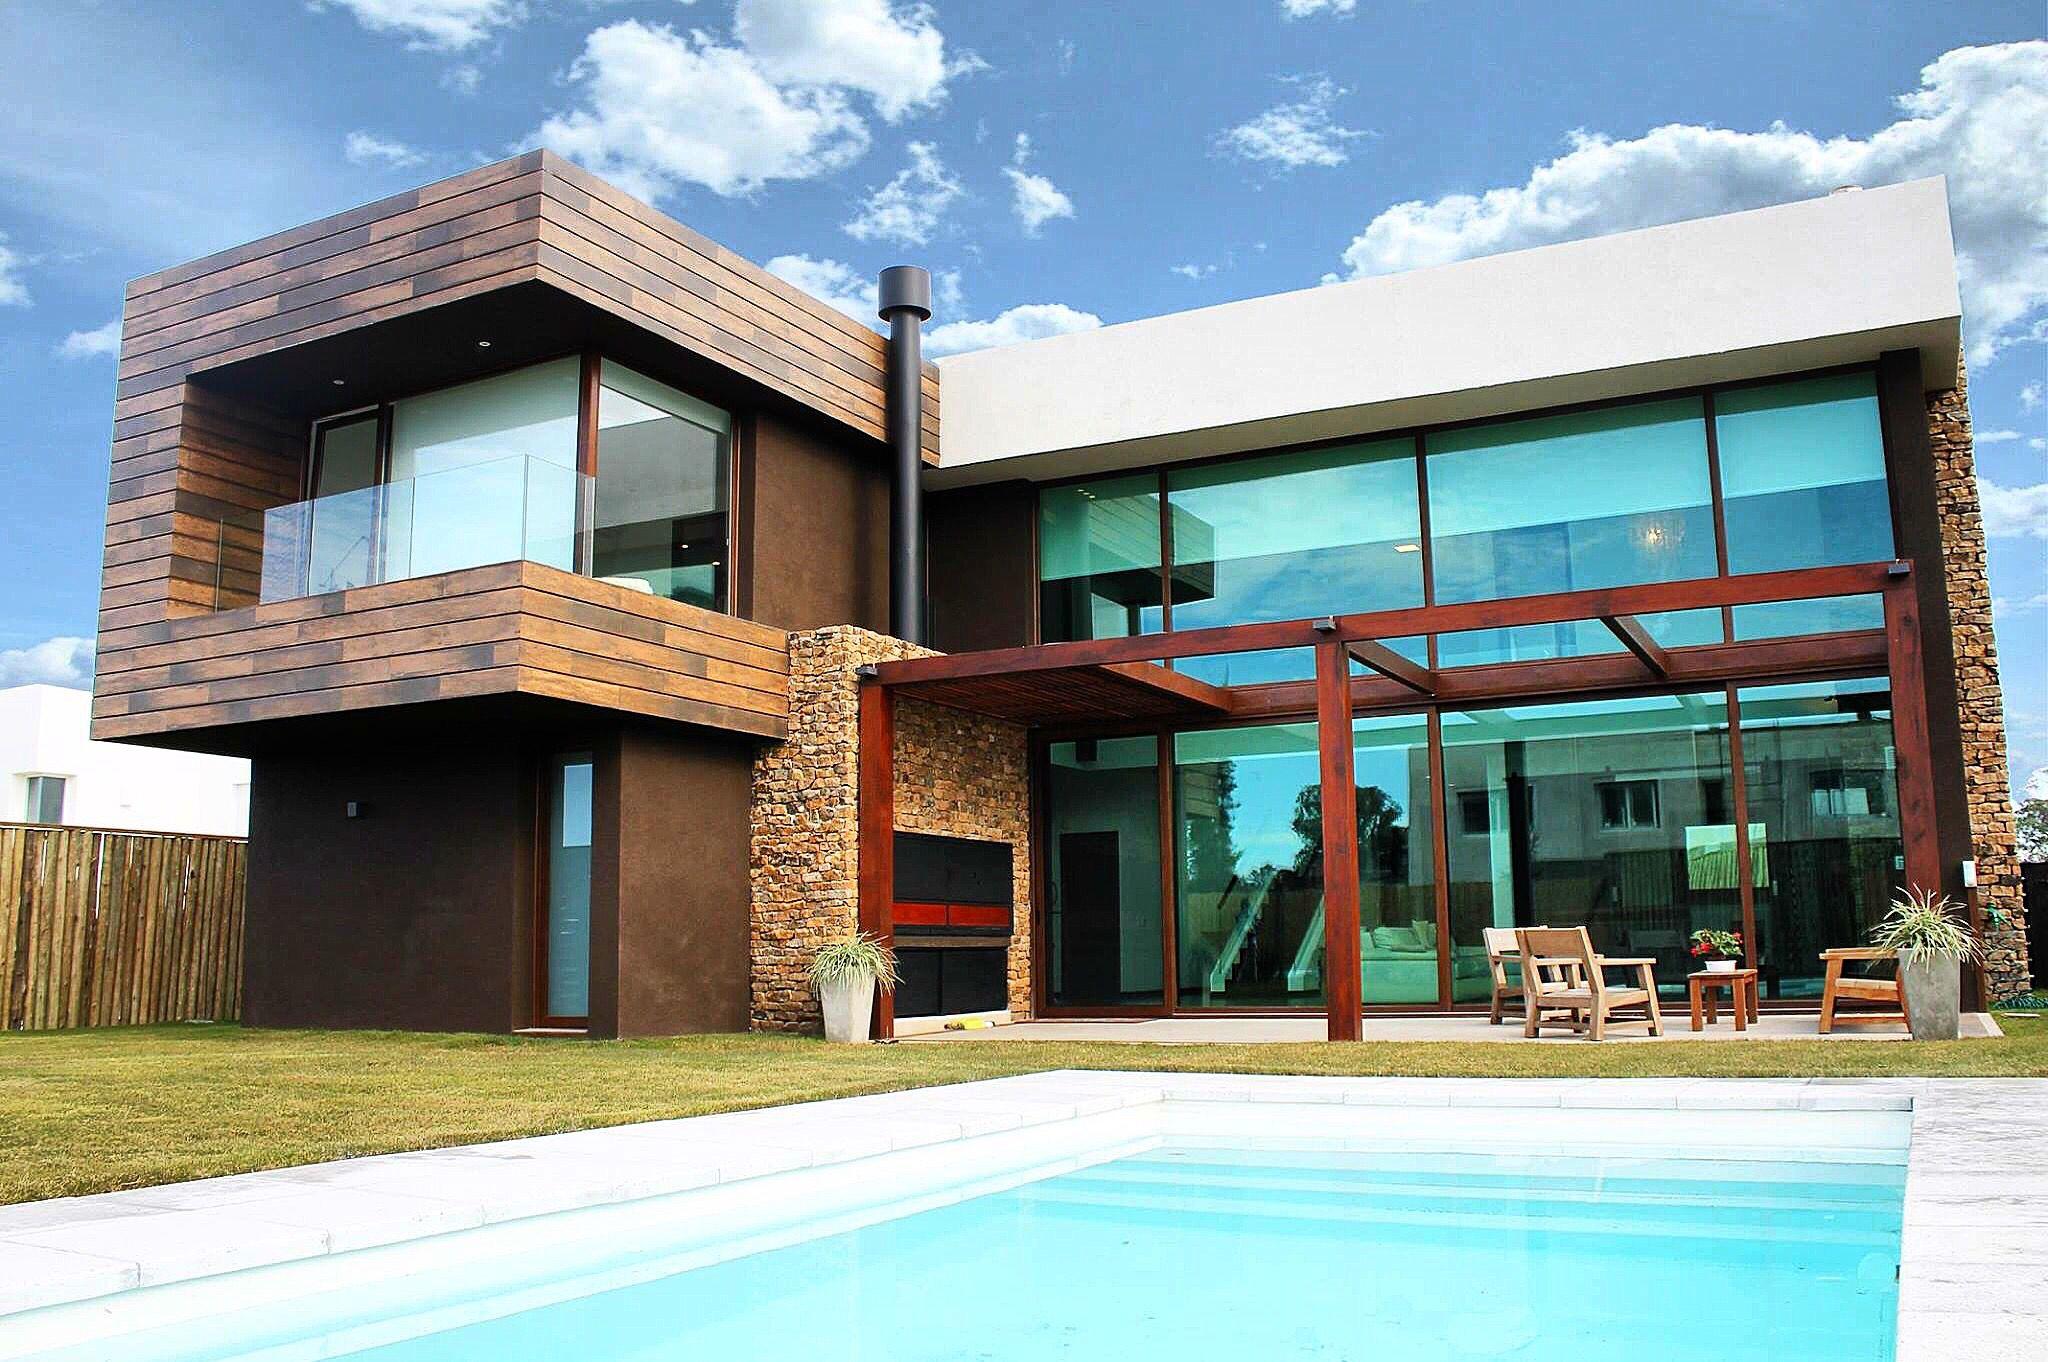 Uruguay montevideo punta del este colonia bazzurro - Casas arquitectura moderna ...